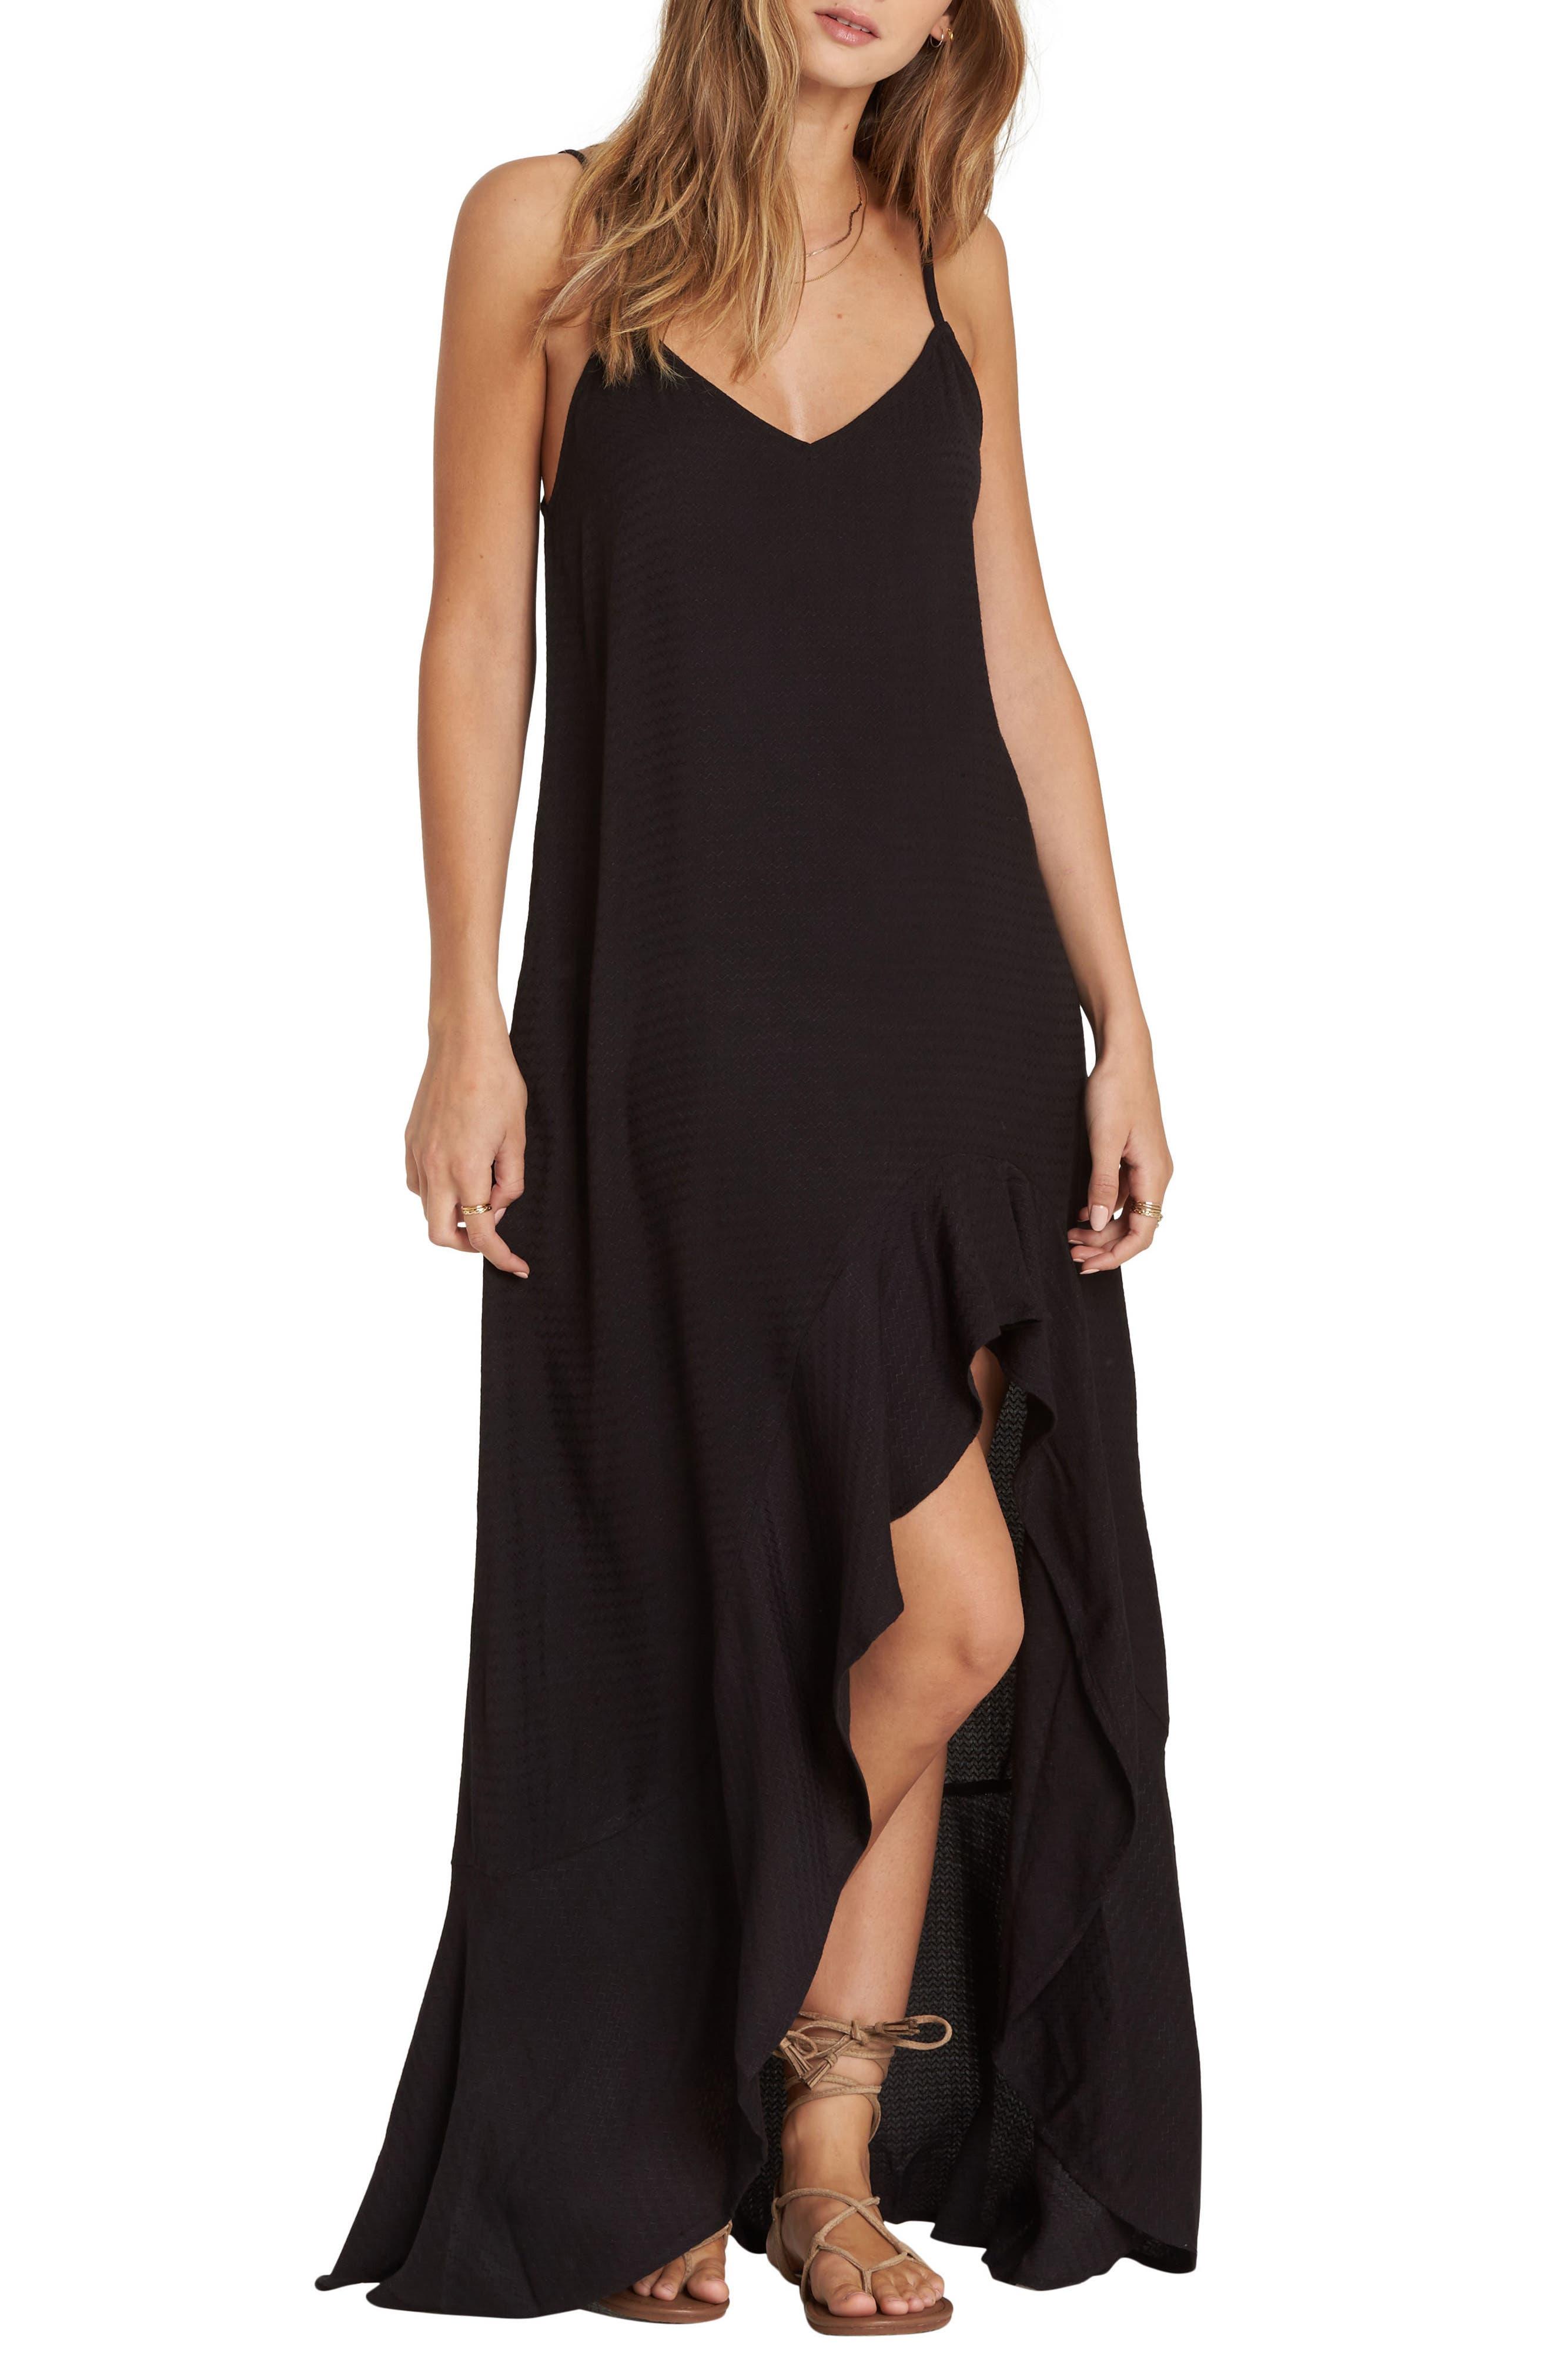 Billabong Kick It Up Maxi Dress, Black